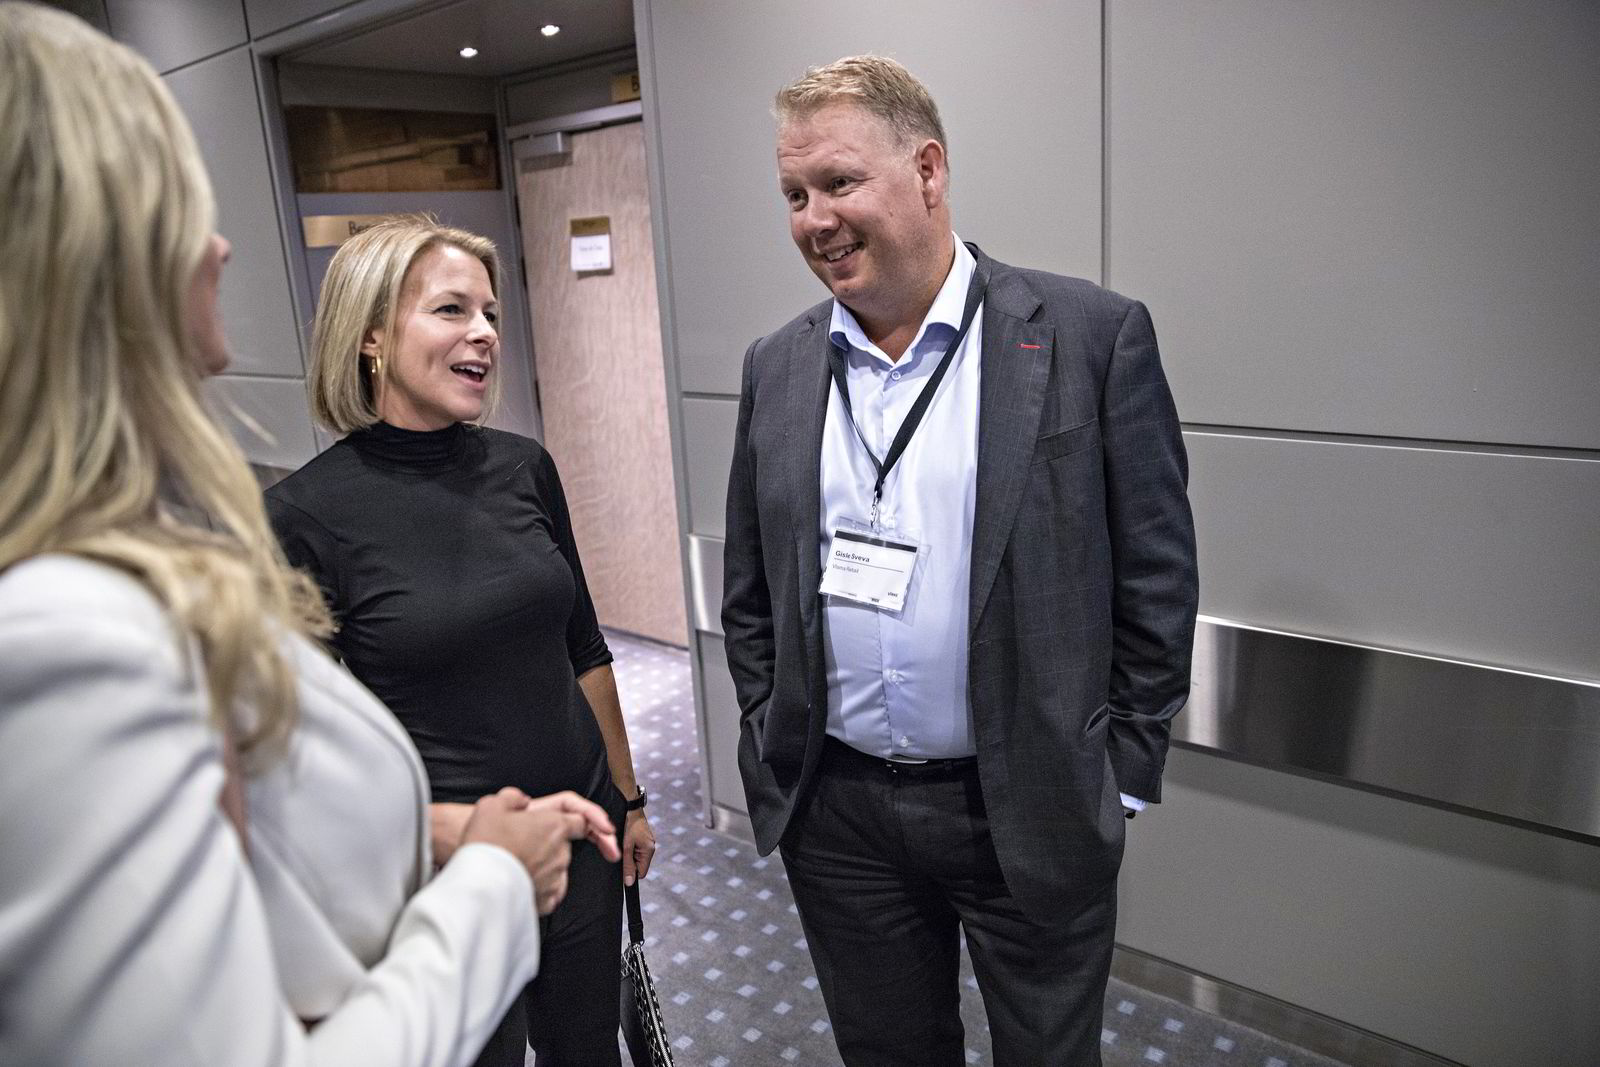 Virkes fagsjef for handel Johanne Kjuus og Geir Sveva, sjef for Visma Retail, under onsdagens handelskonferanse. Foto: Aleksander Nordahl